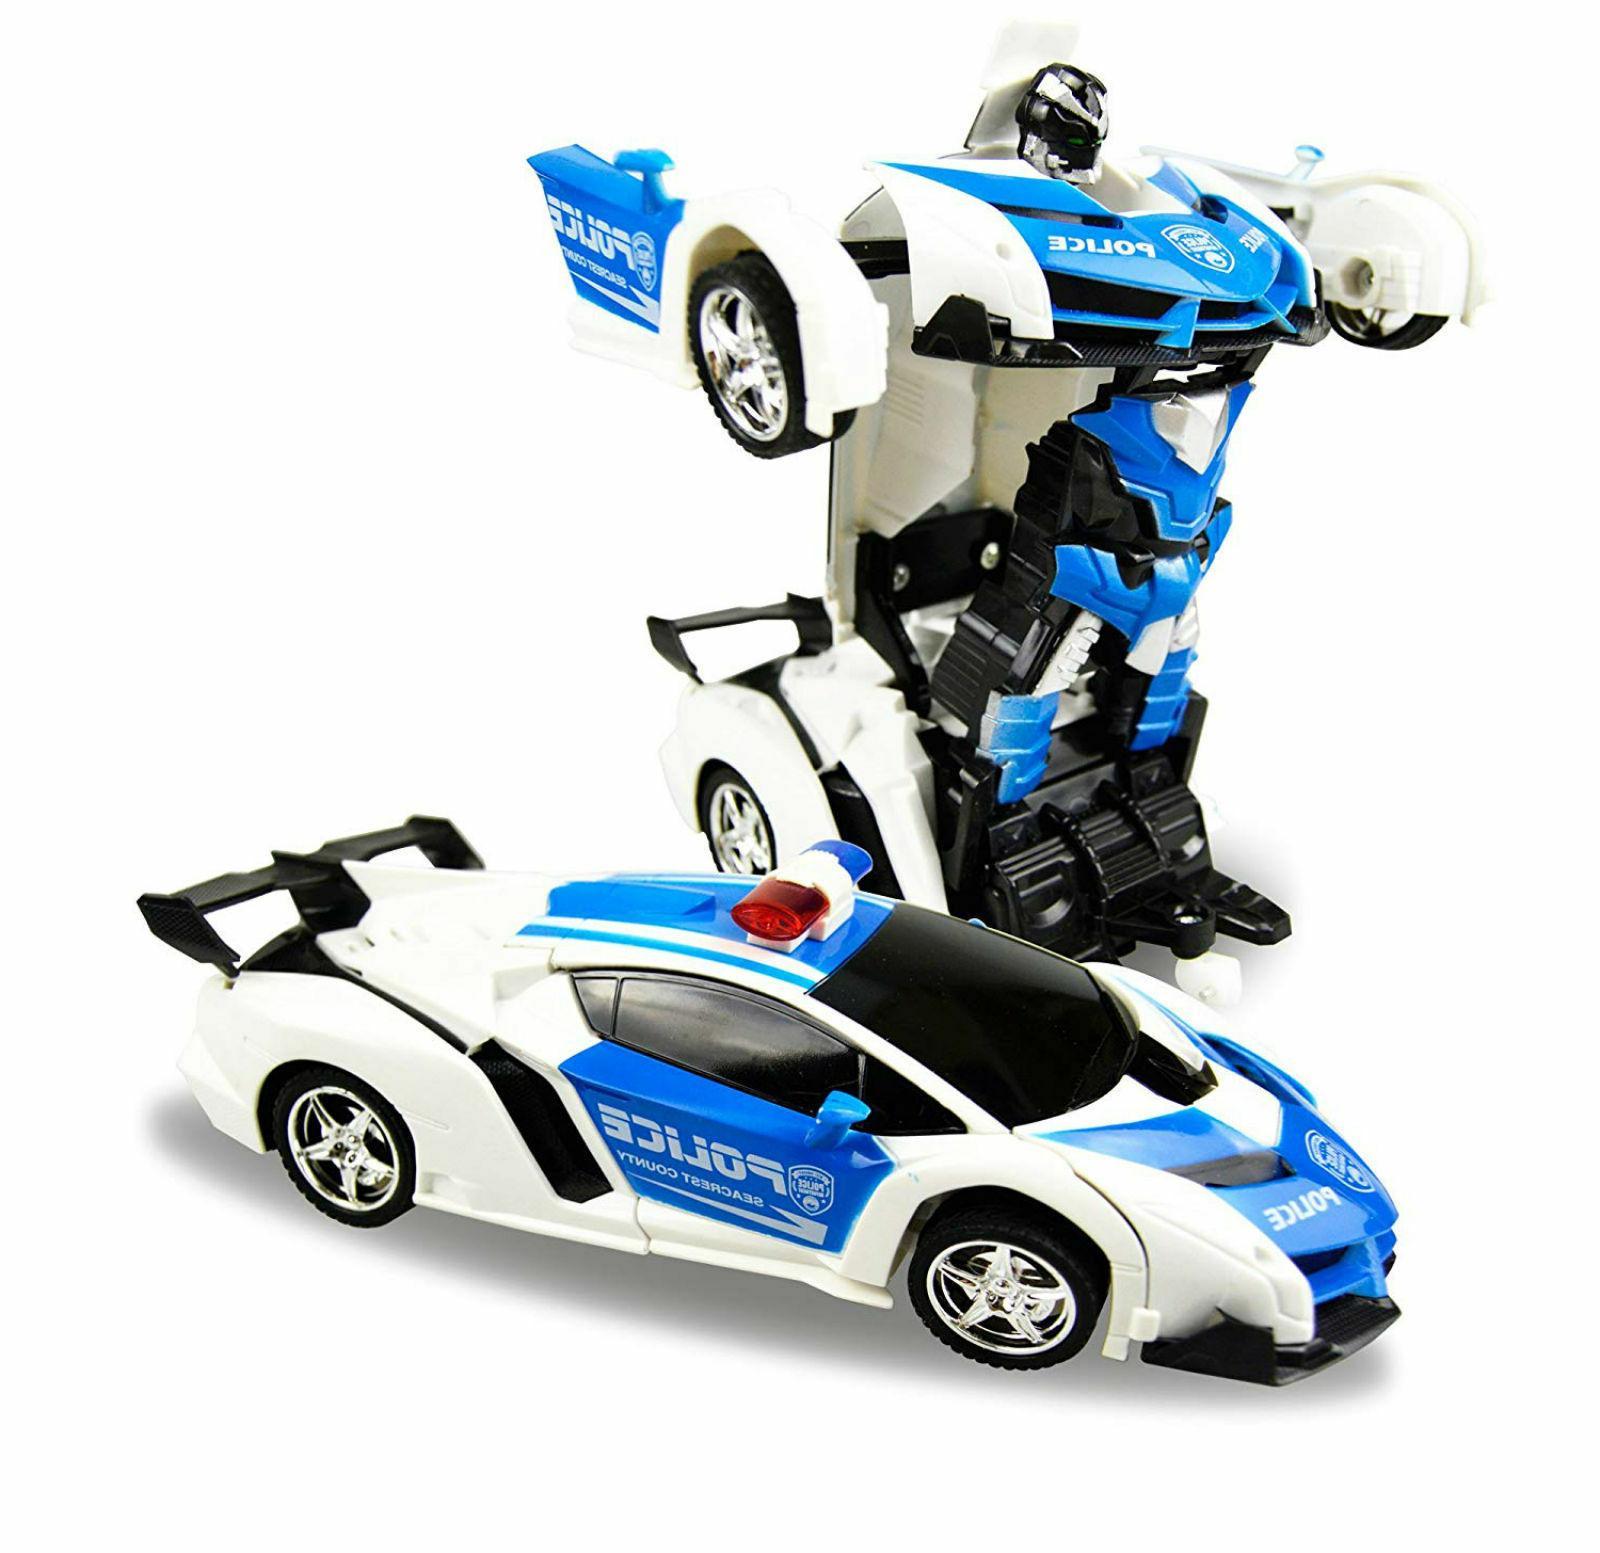 RC Transform Car Robot Toy Kids Vehicle Remote Control Fun P